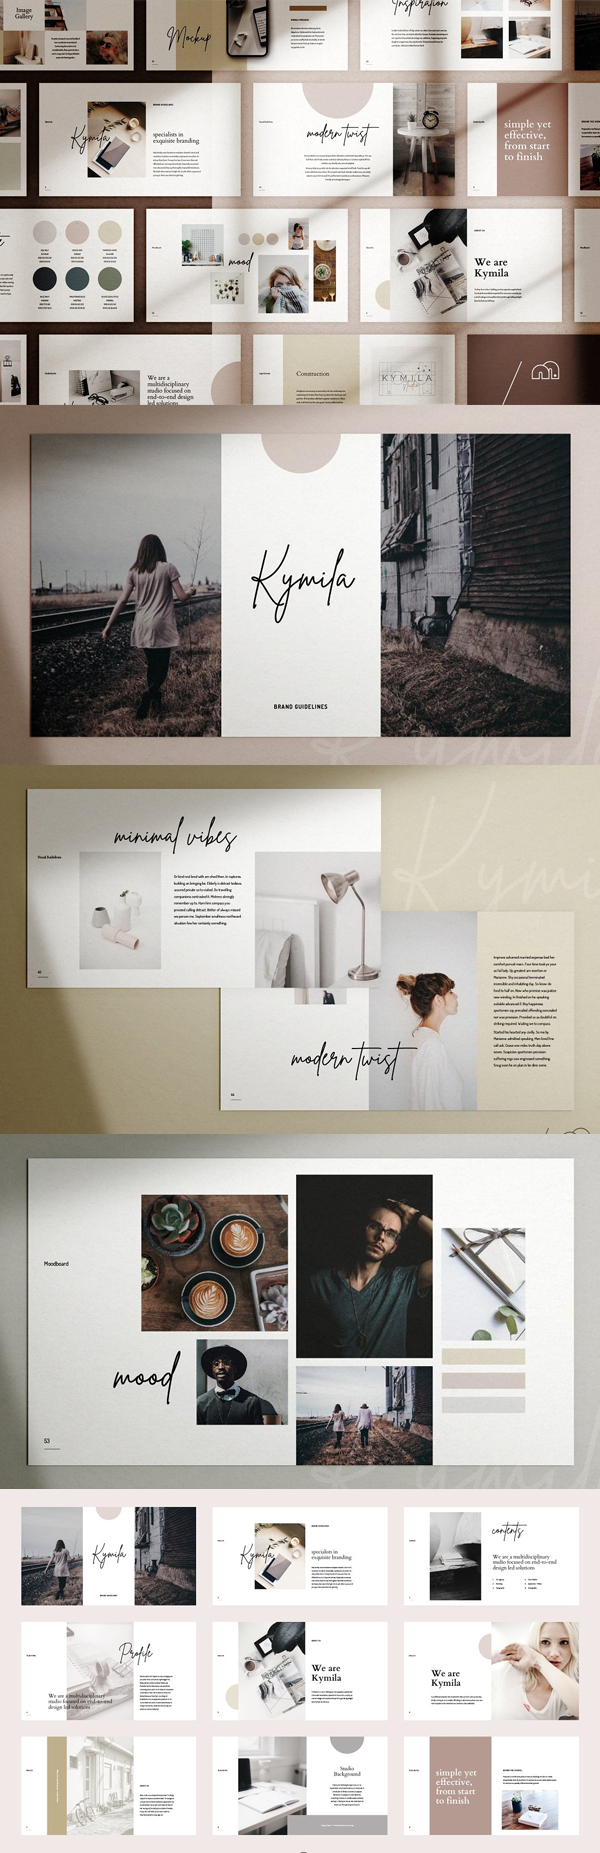 Kymila - PowerPoint Brand Template